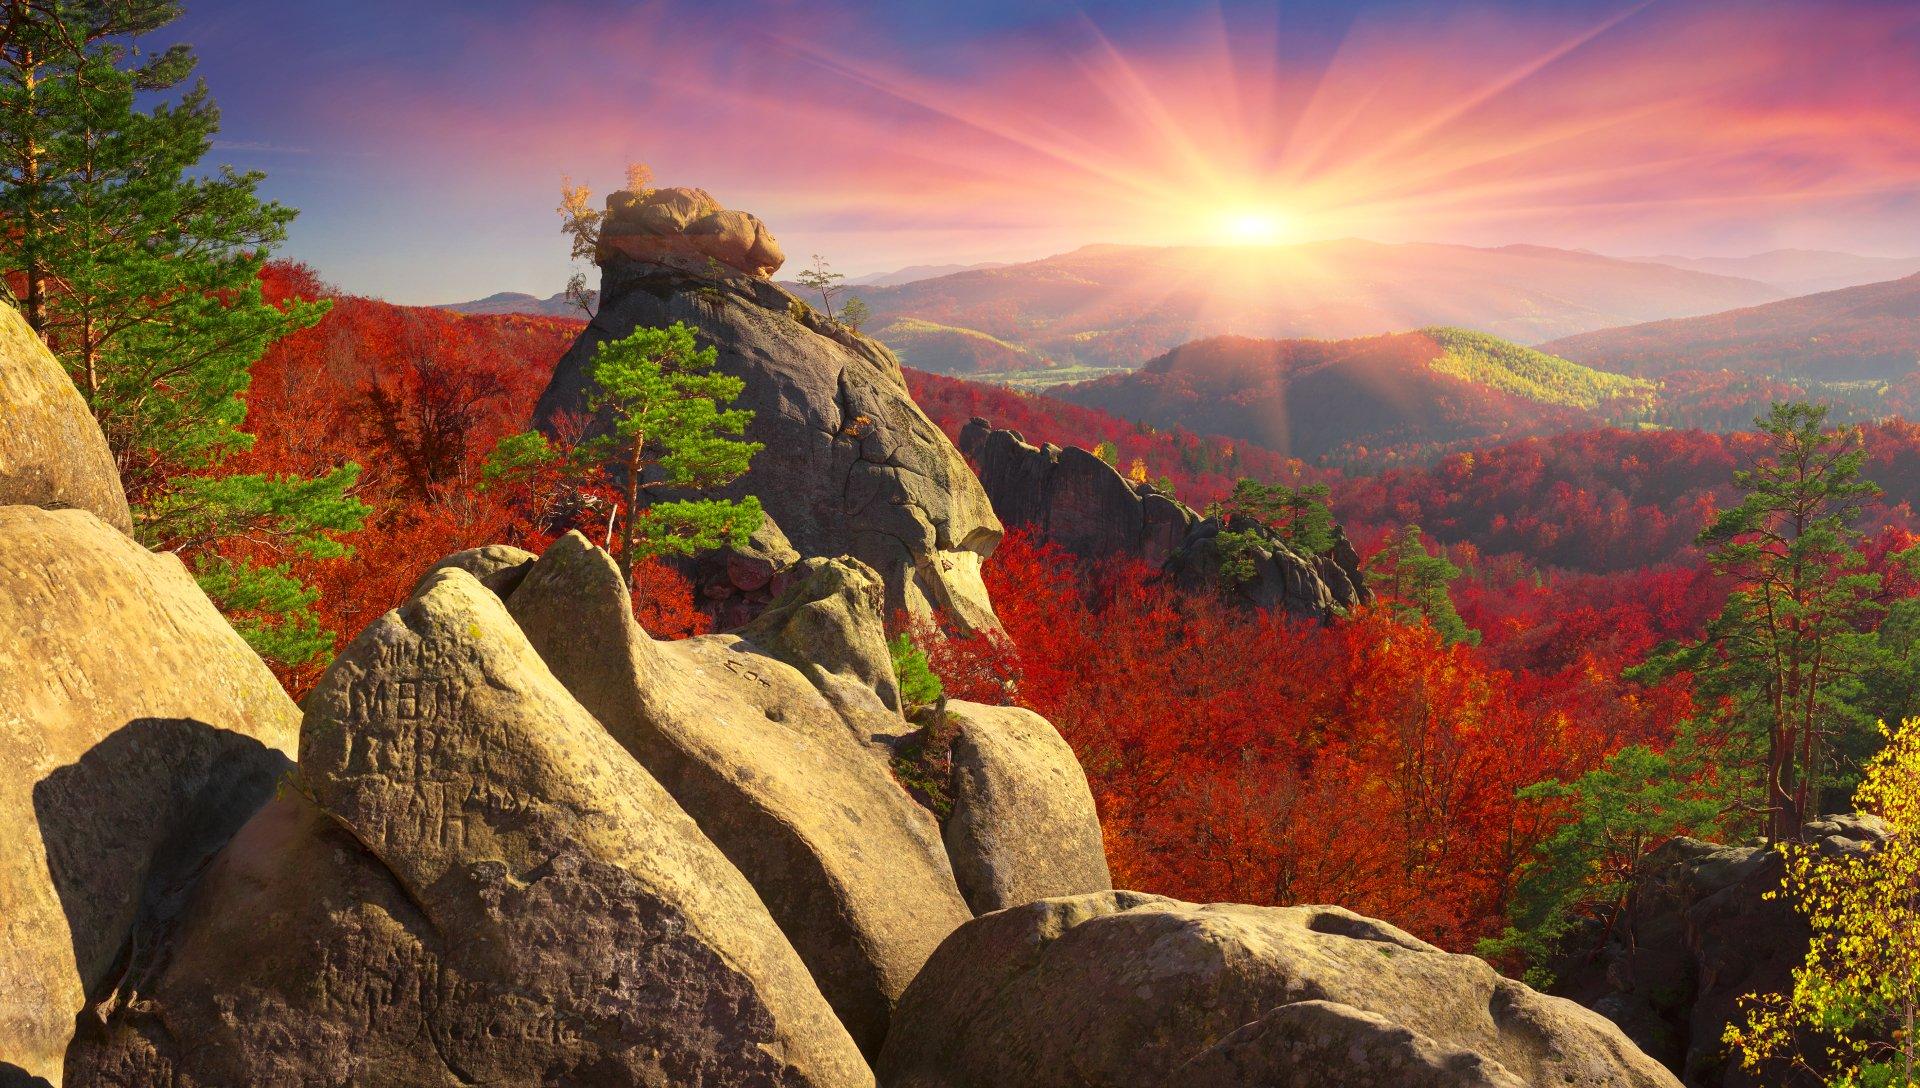 Earth - Mountain  Earth Landscape Rock Forest Tree Fall Foliage Sunset Sun Wallpaper